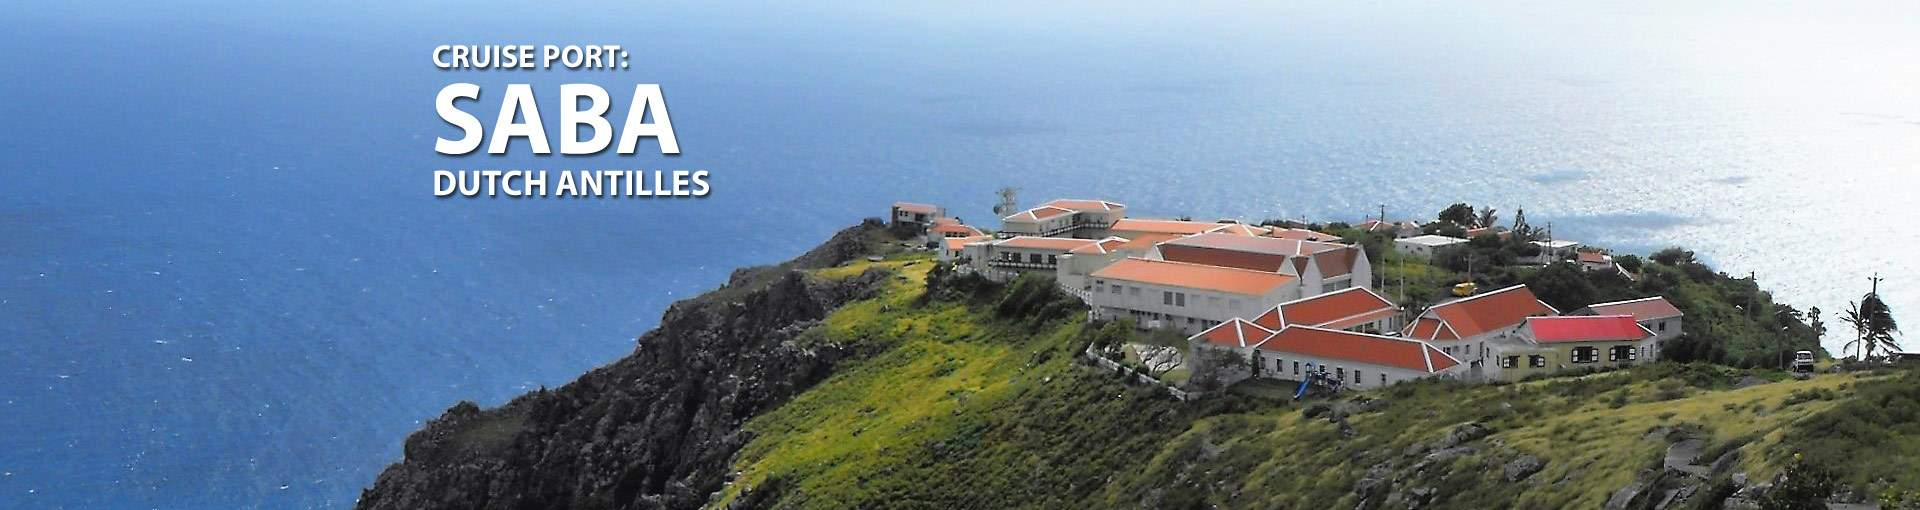 Saba, Dutch Antilles Cruise Port